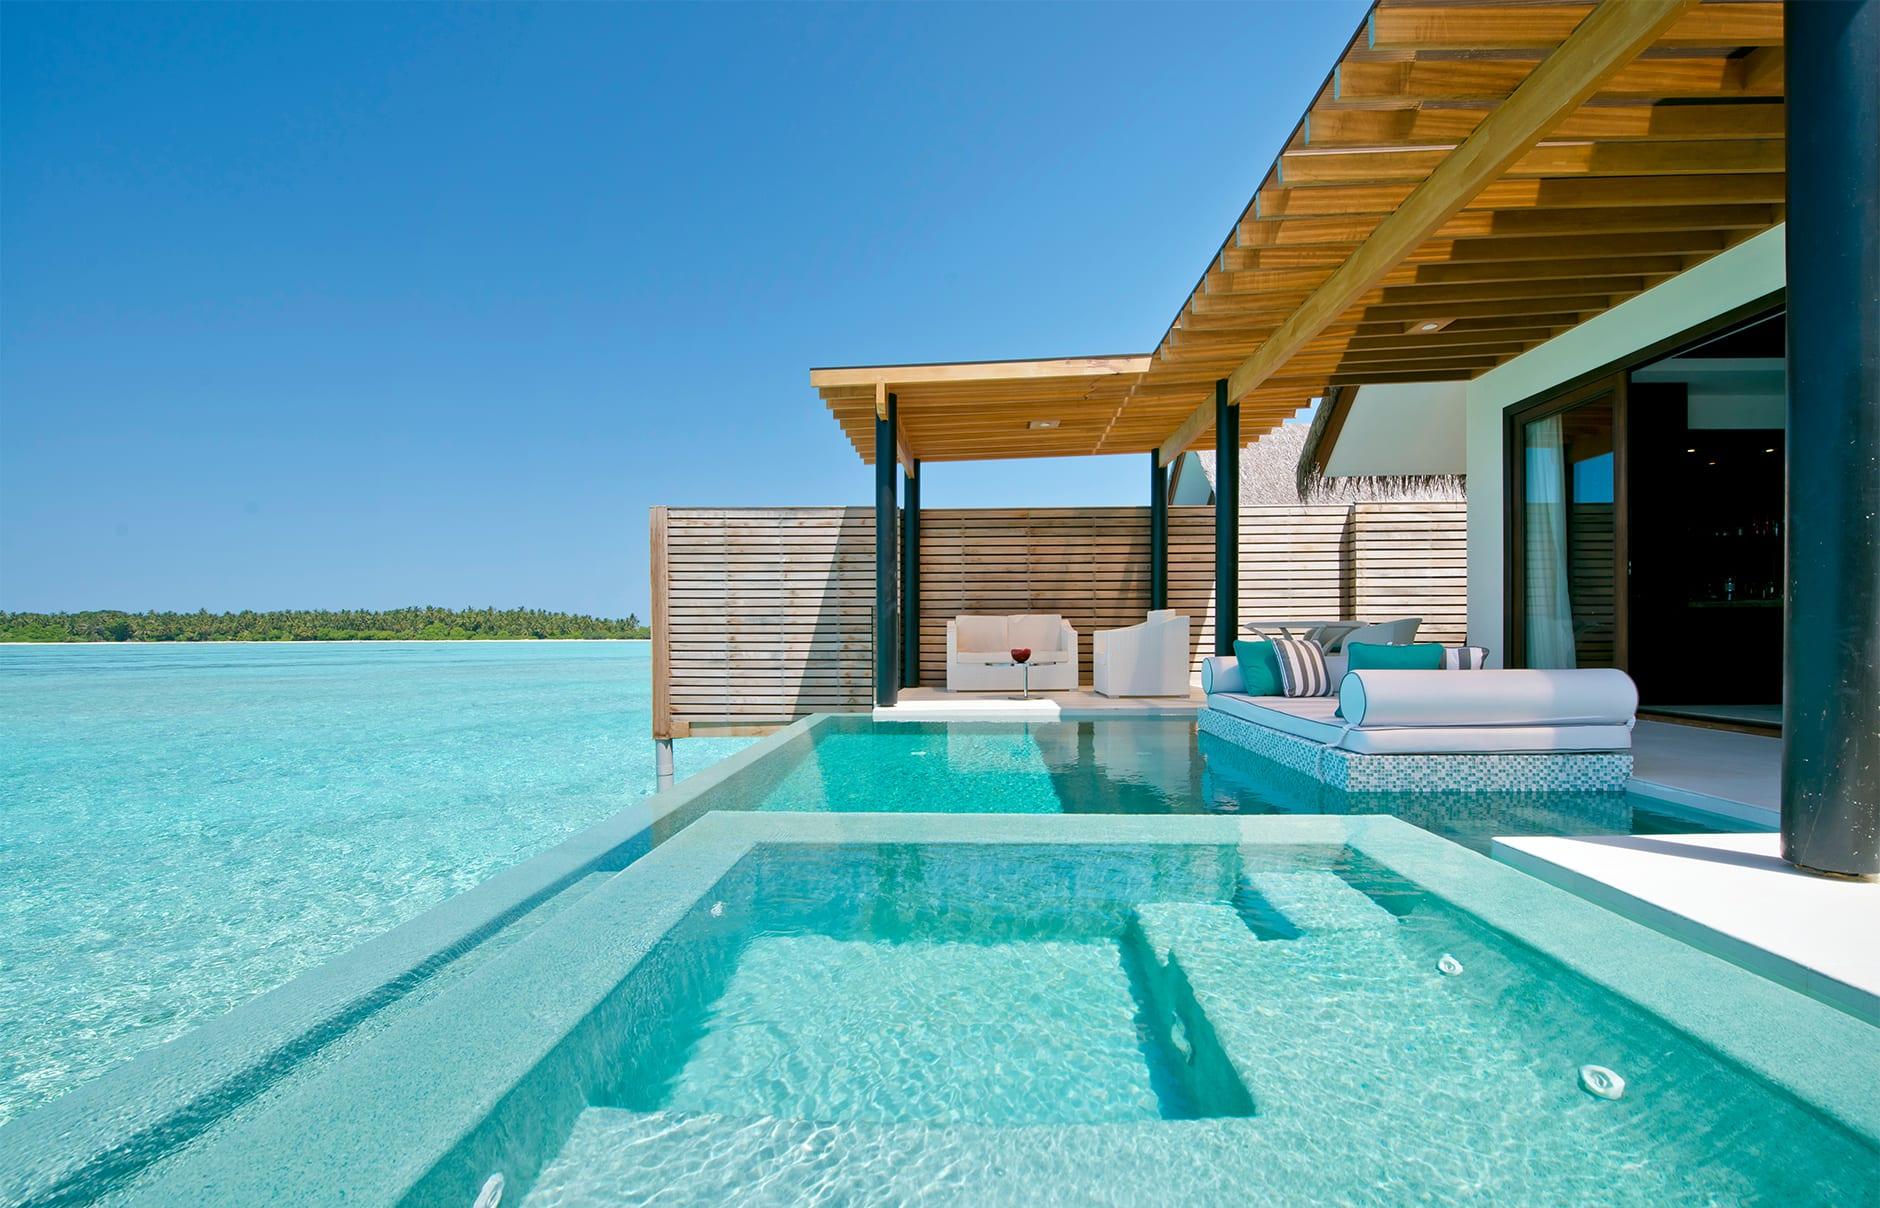 Deluxe Water Studio. Niyama, Maldives. © Per AQUUM